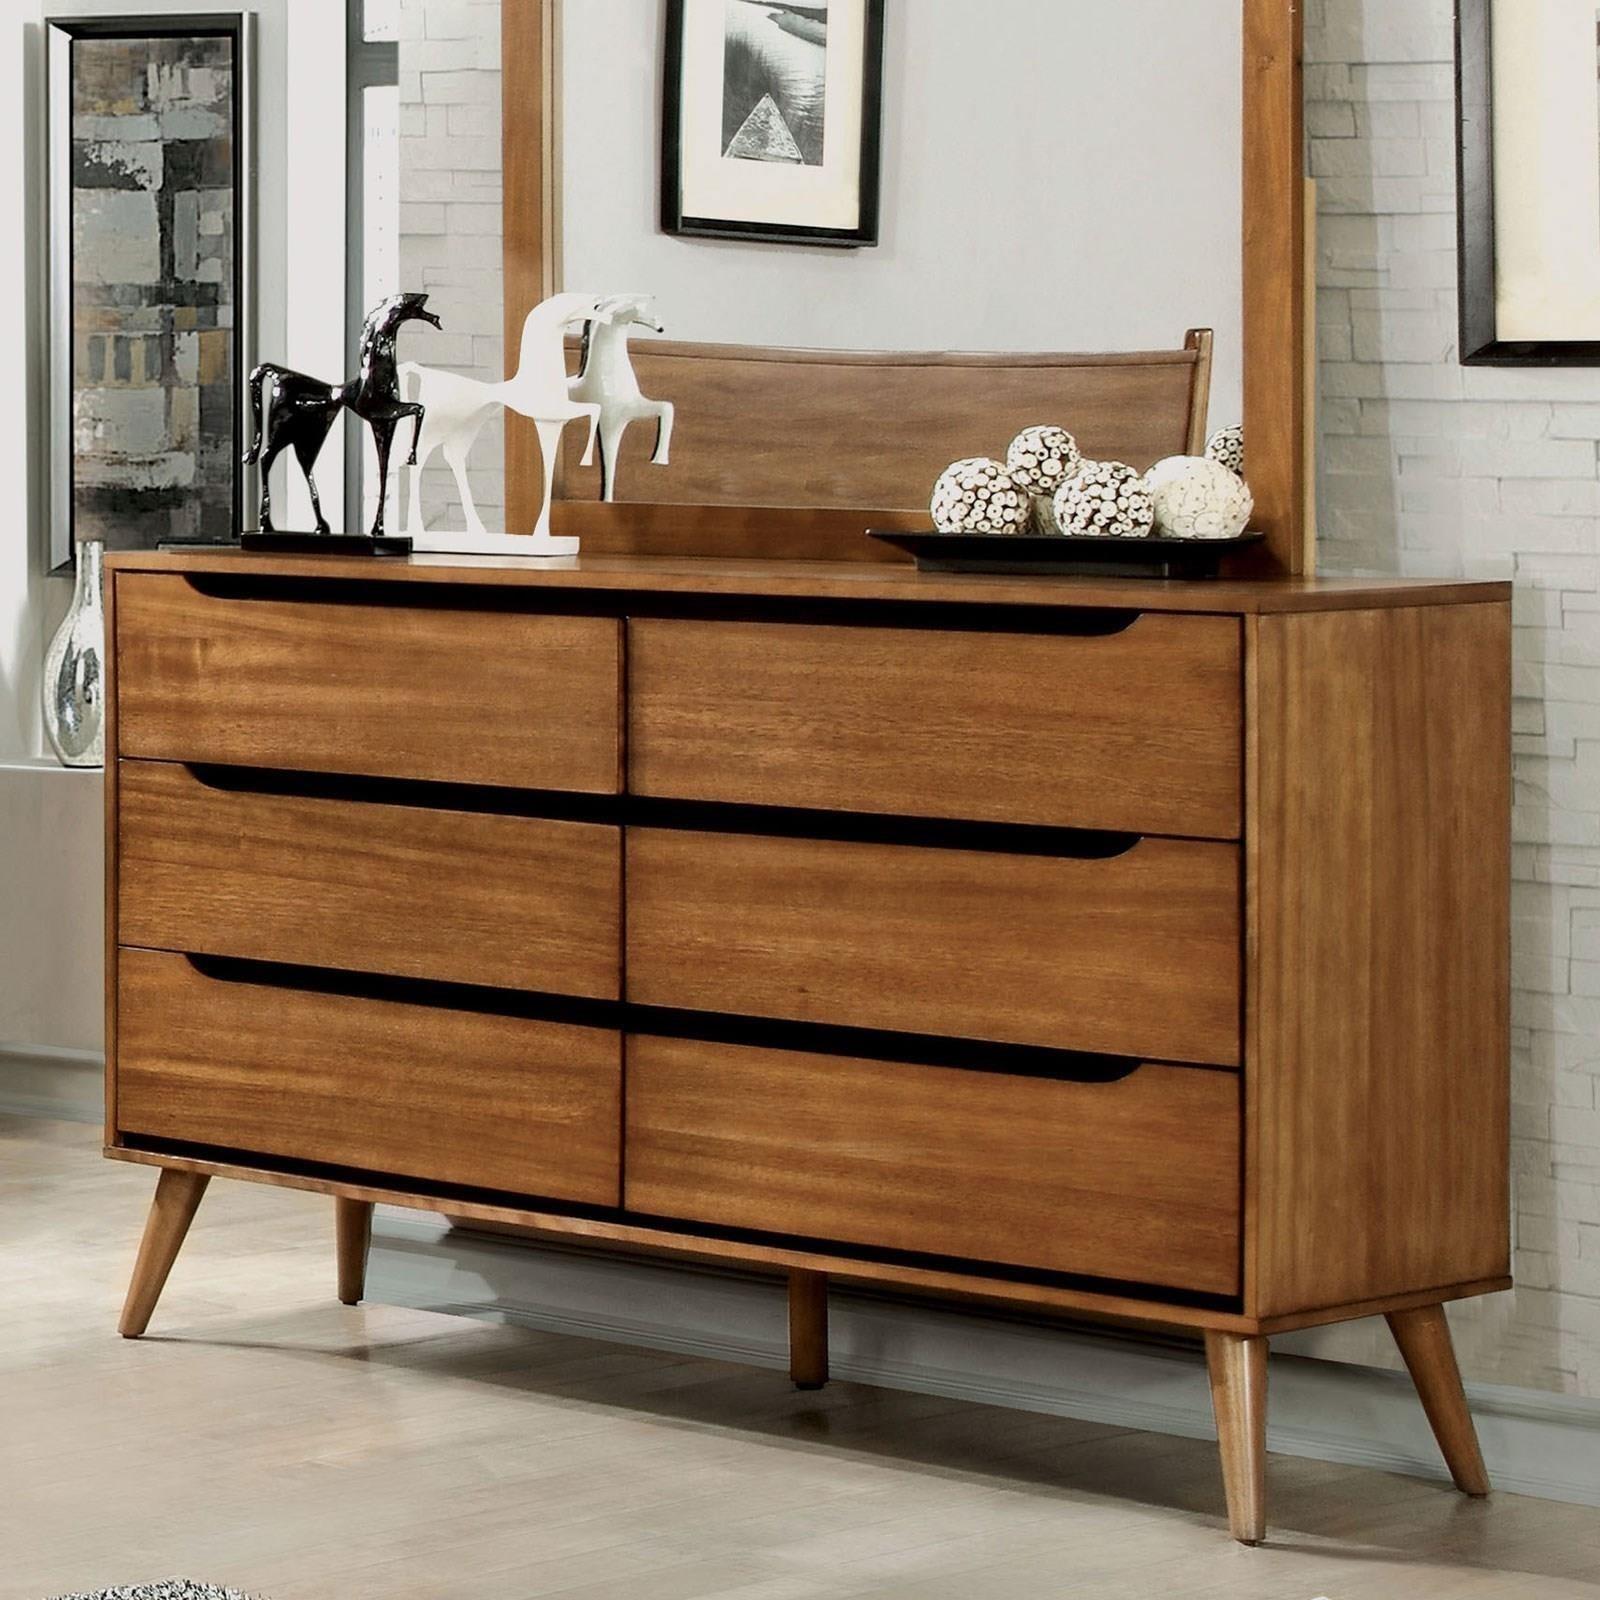 Lennart Dresser by Furniture of America at Nassau Furniture and Mattress